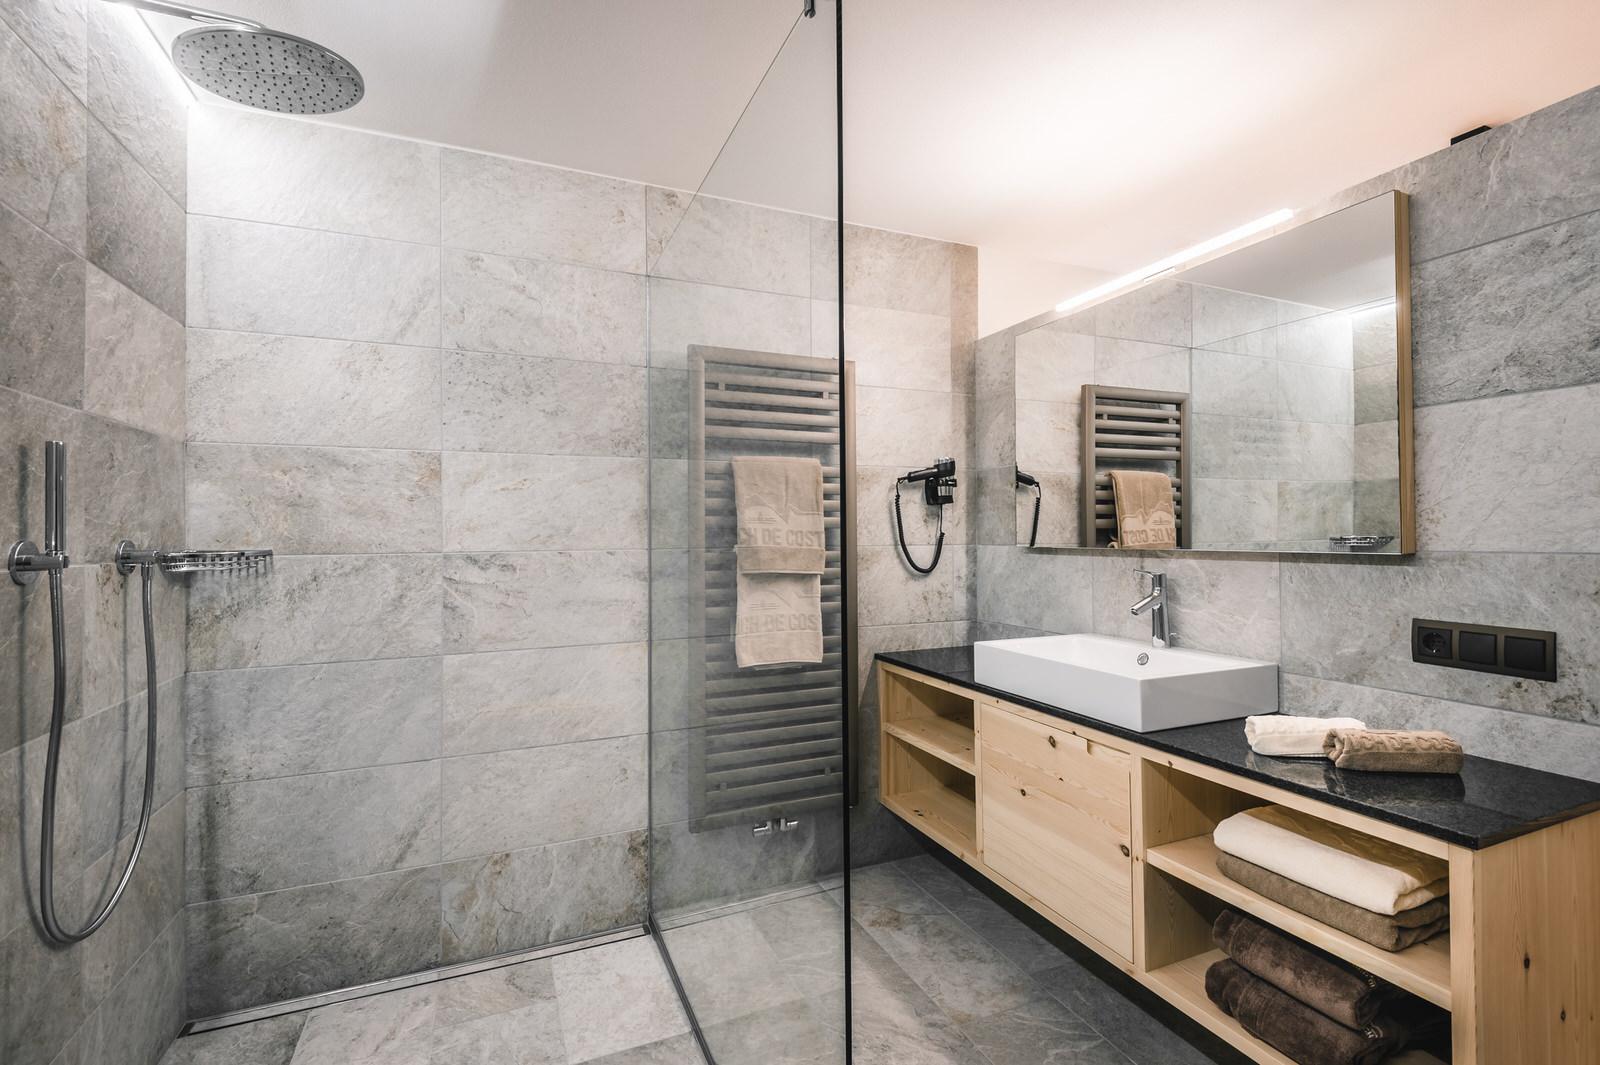 Apartment Barantl Badezimmer